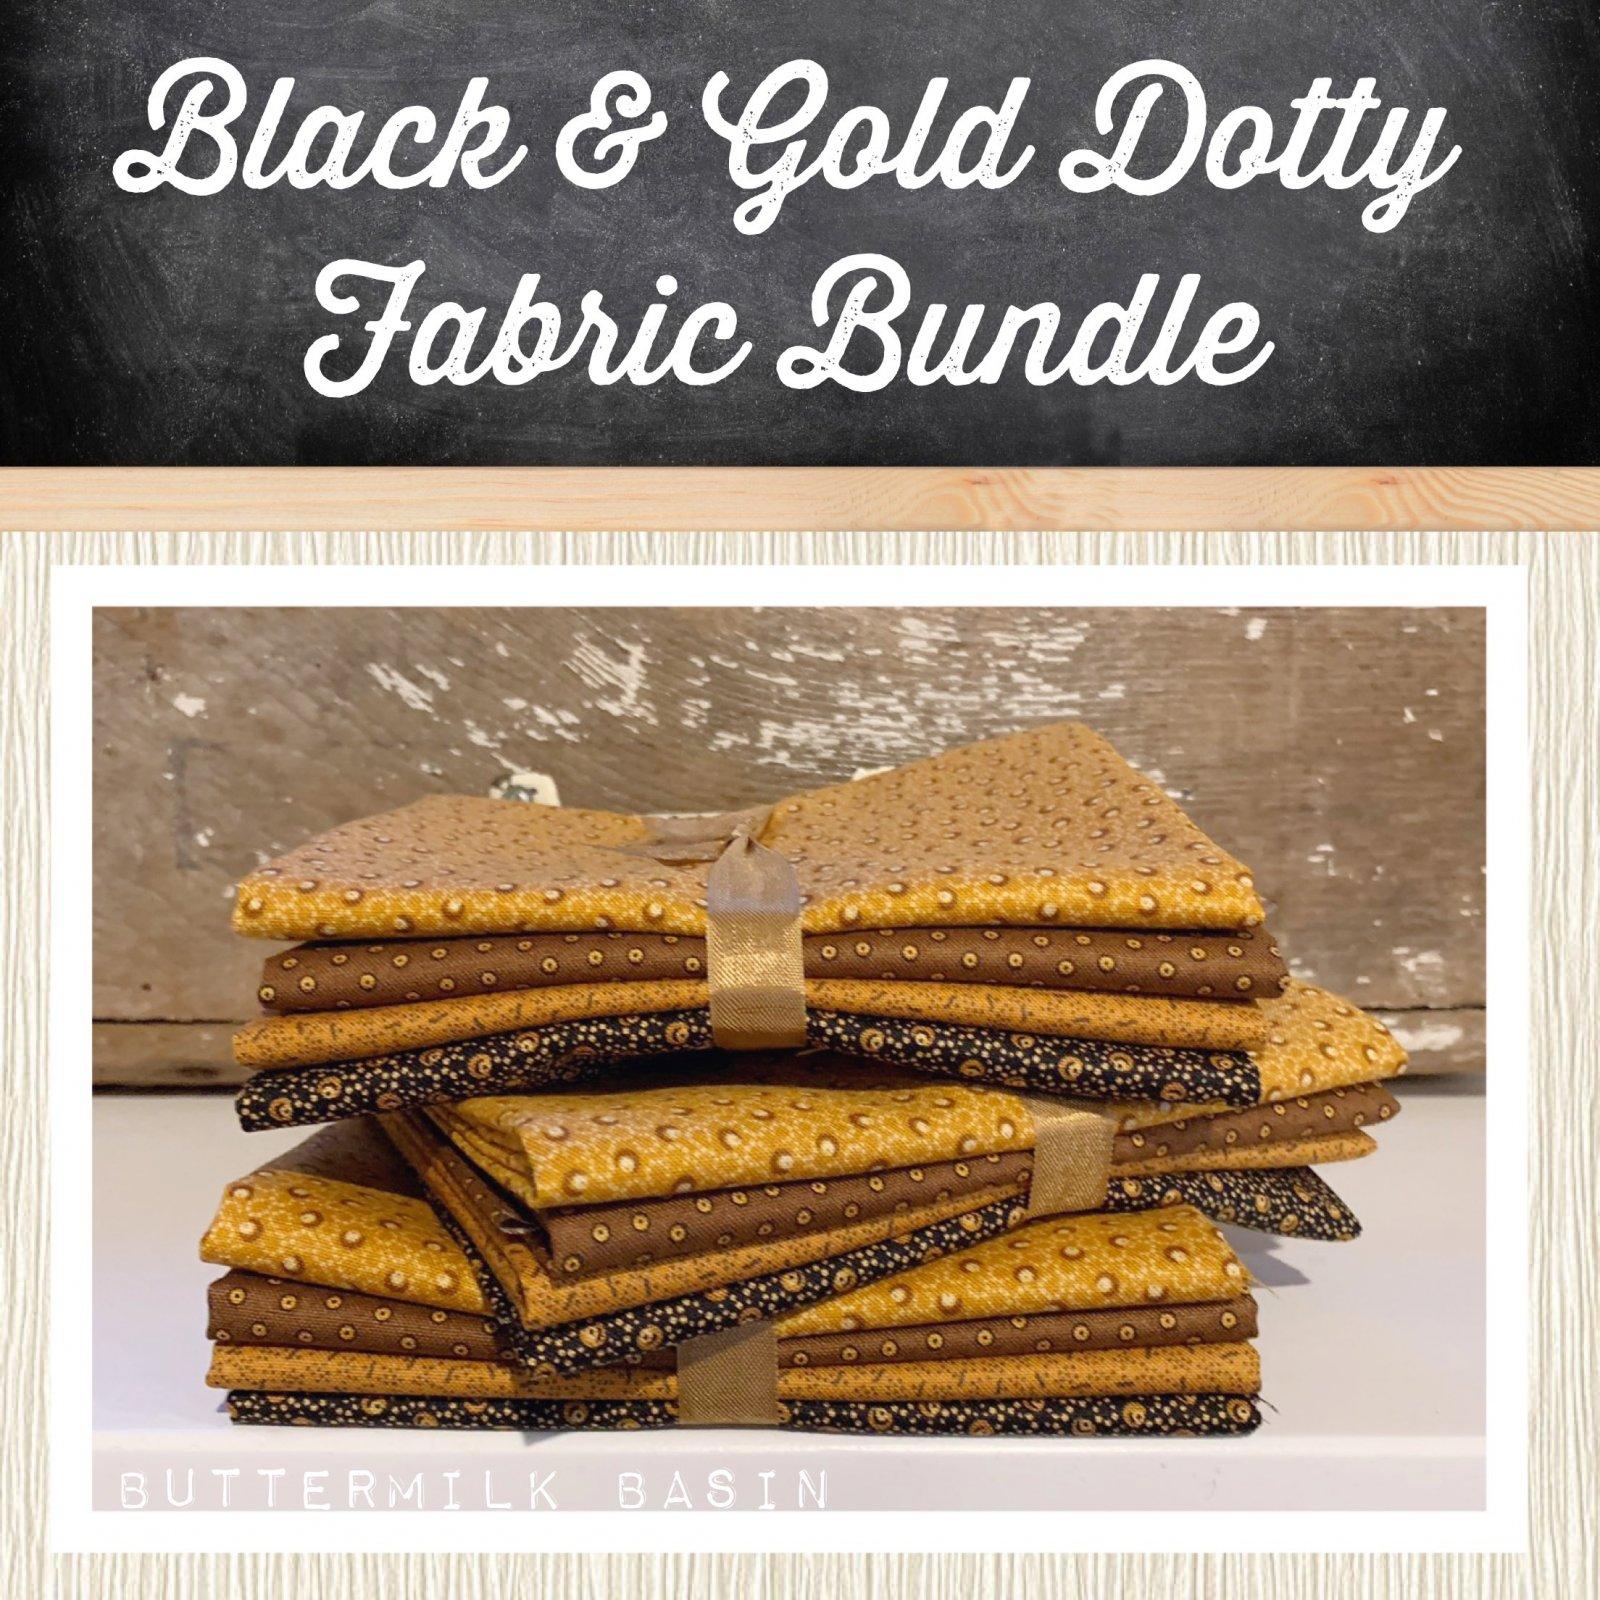 Black & Gold Dotty Fabric Bundle